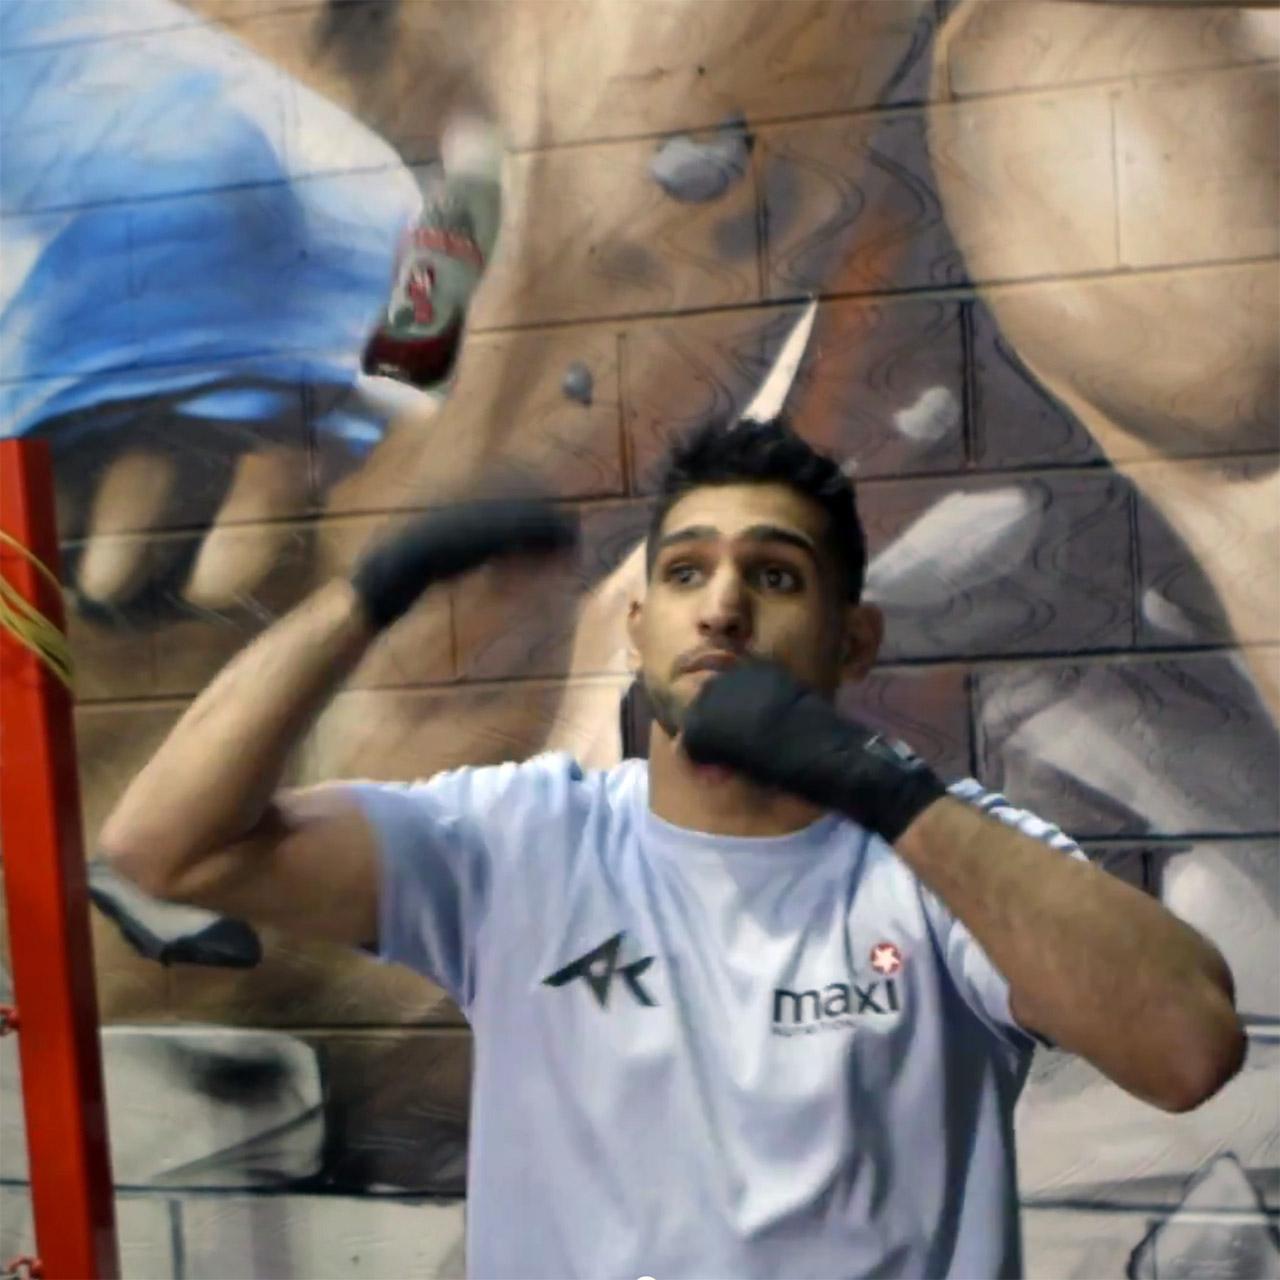 Amir Khan boxing trick with milk bottle